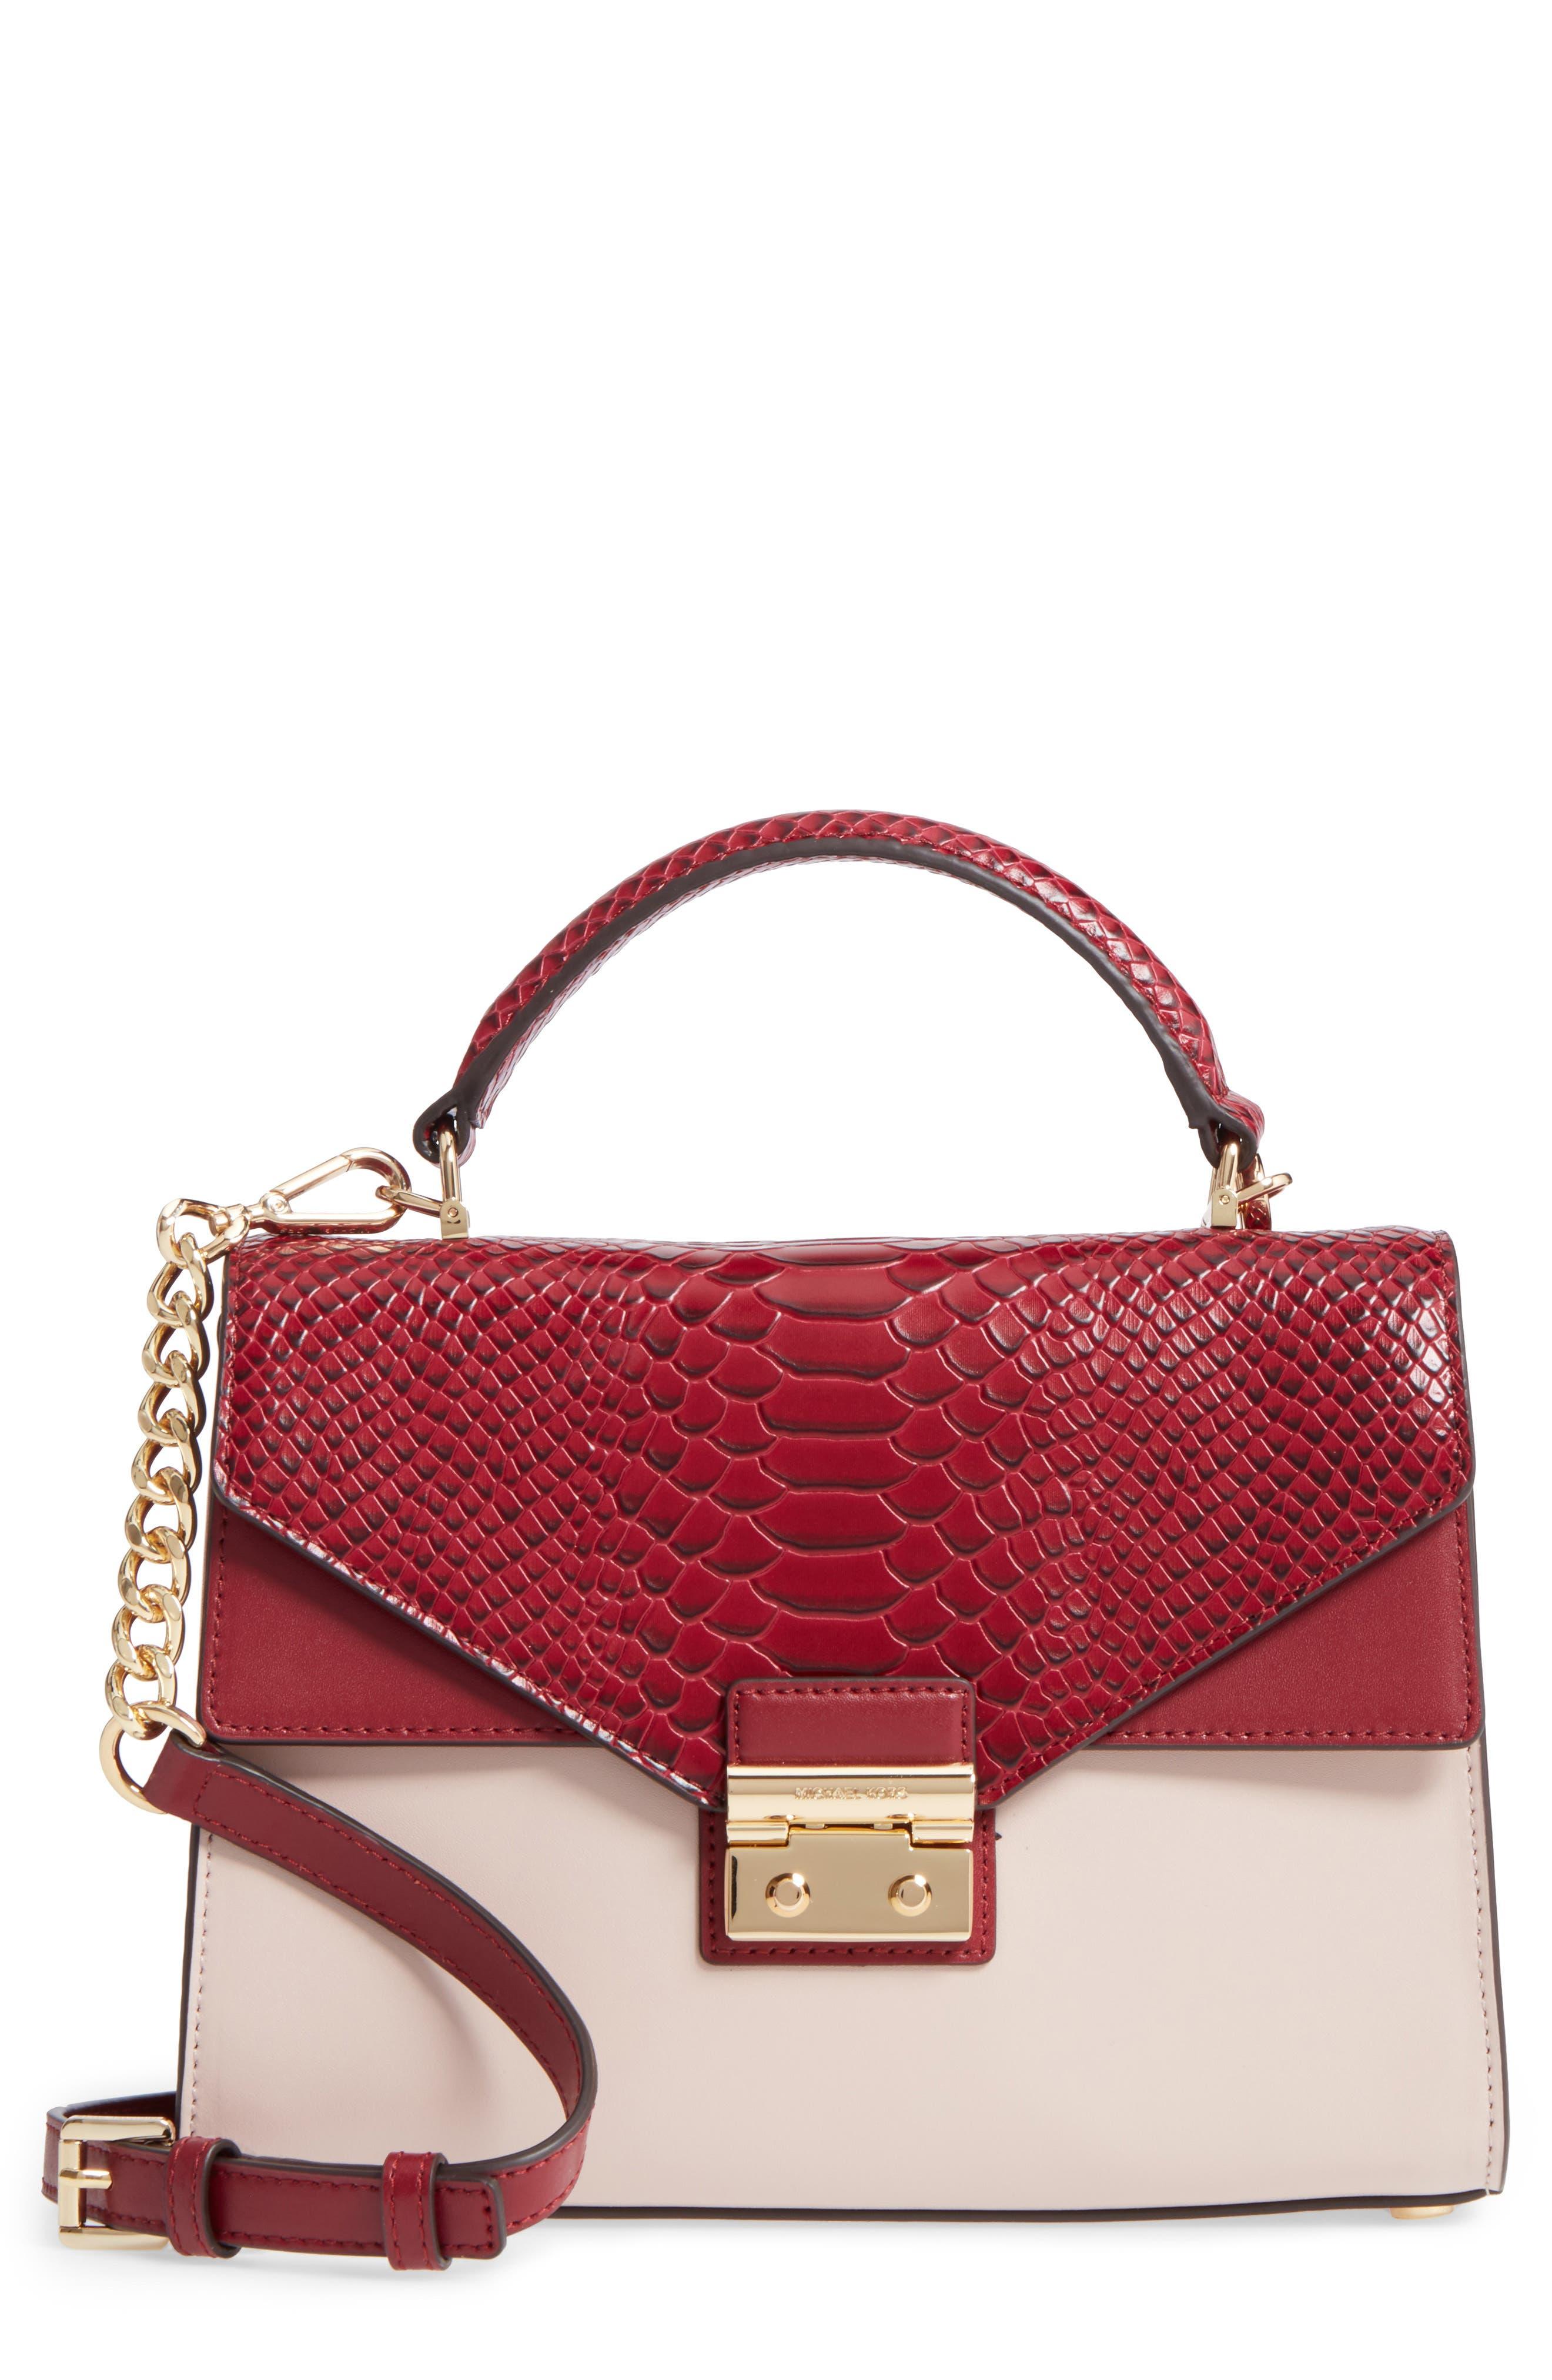 Medium Sloan Leather Shoulder Bag,                             Main thumbnail 1, color,                             686